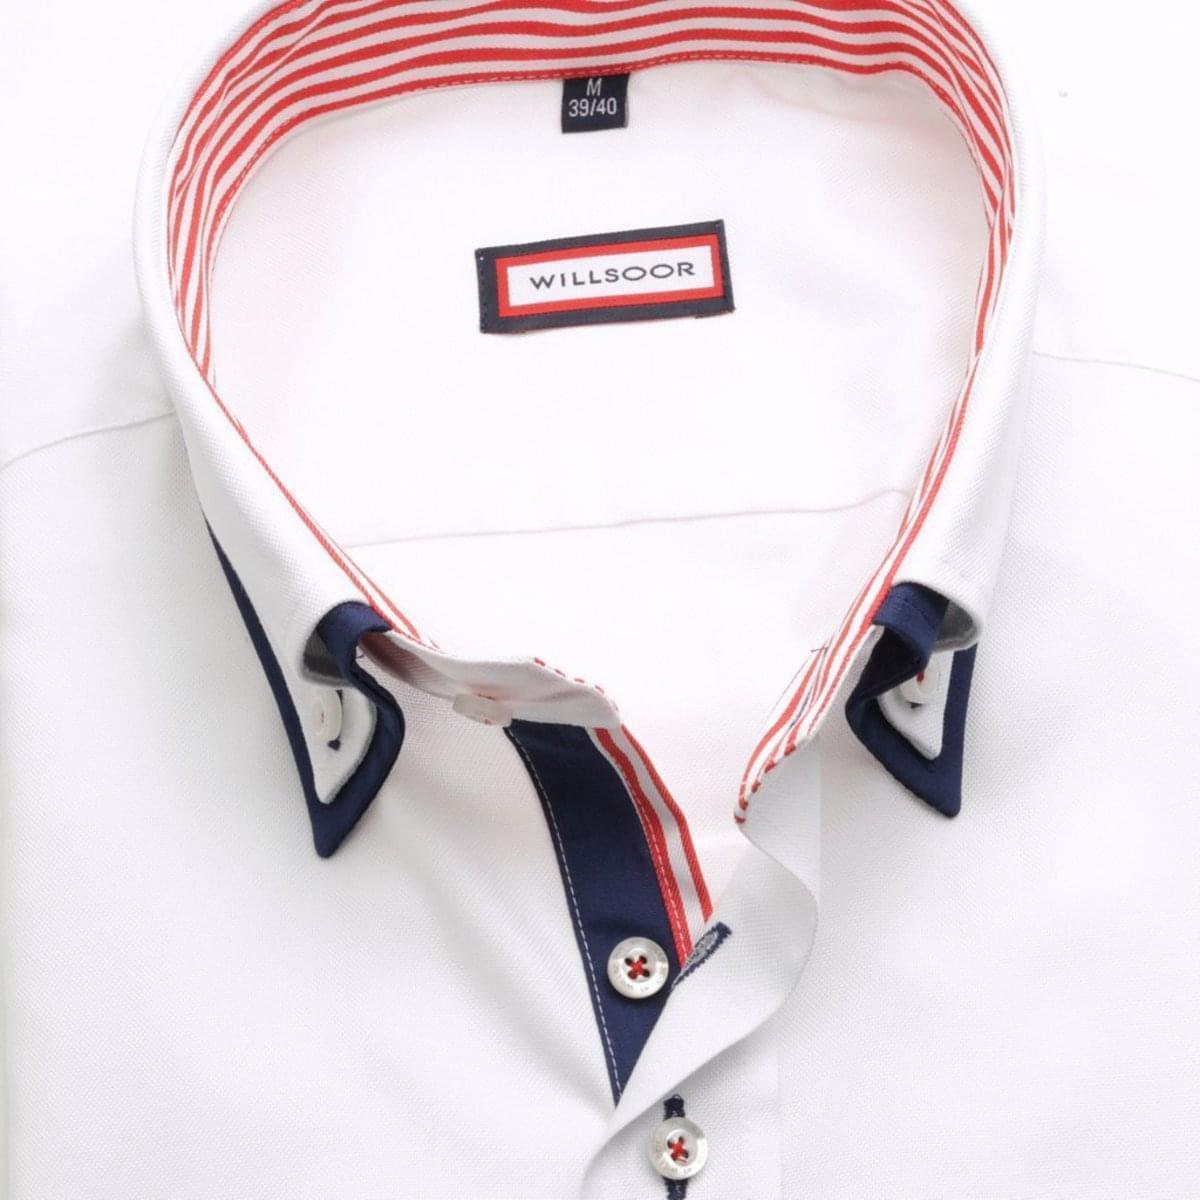 Willsoor Pánská košile WR Slim Fit (výška 176-182) 1967 176-182 / M (39/40)